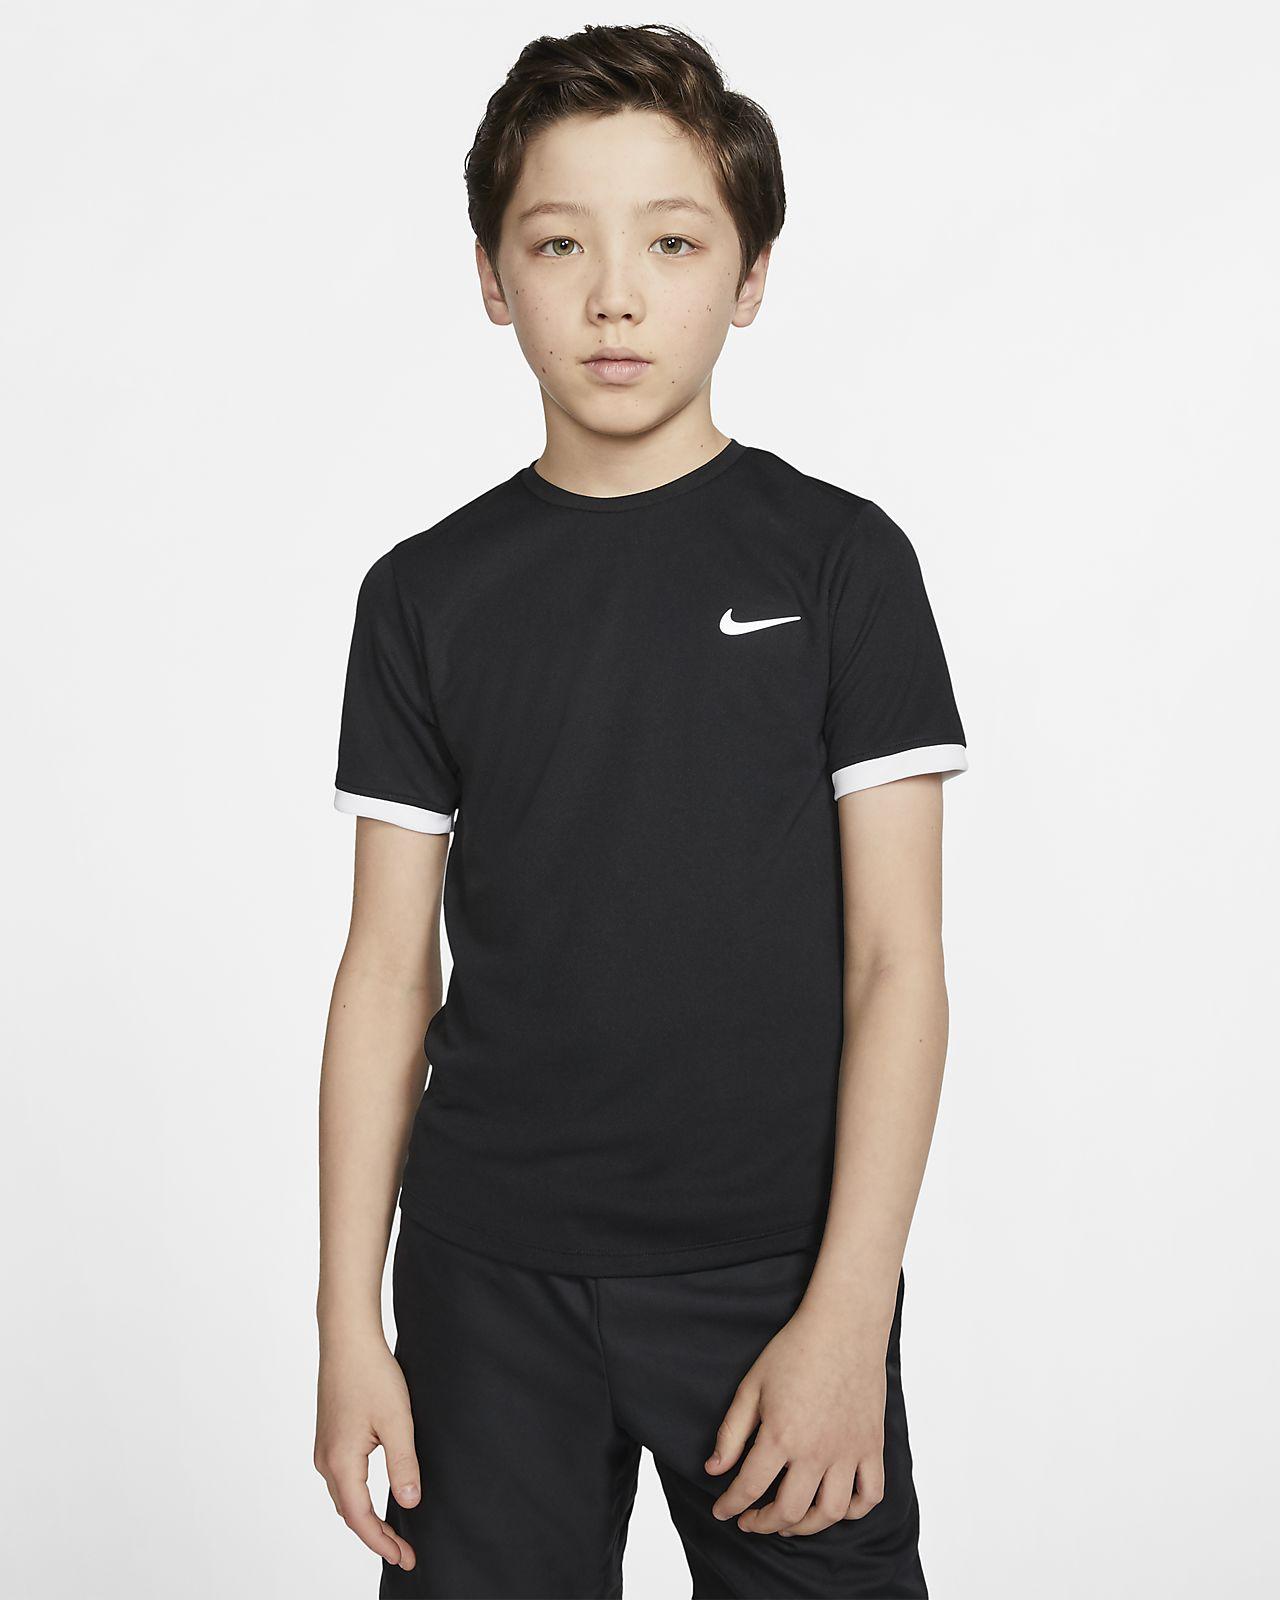 NikeCourt Dri-FIT Older Kids' (Boys') Short-Sleeve Tennis Top